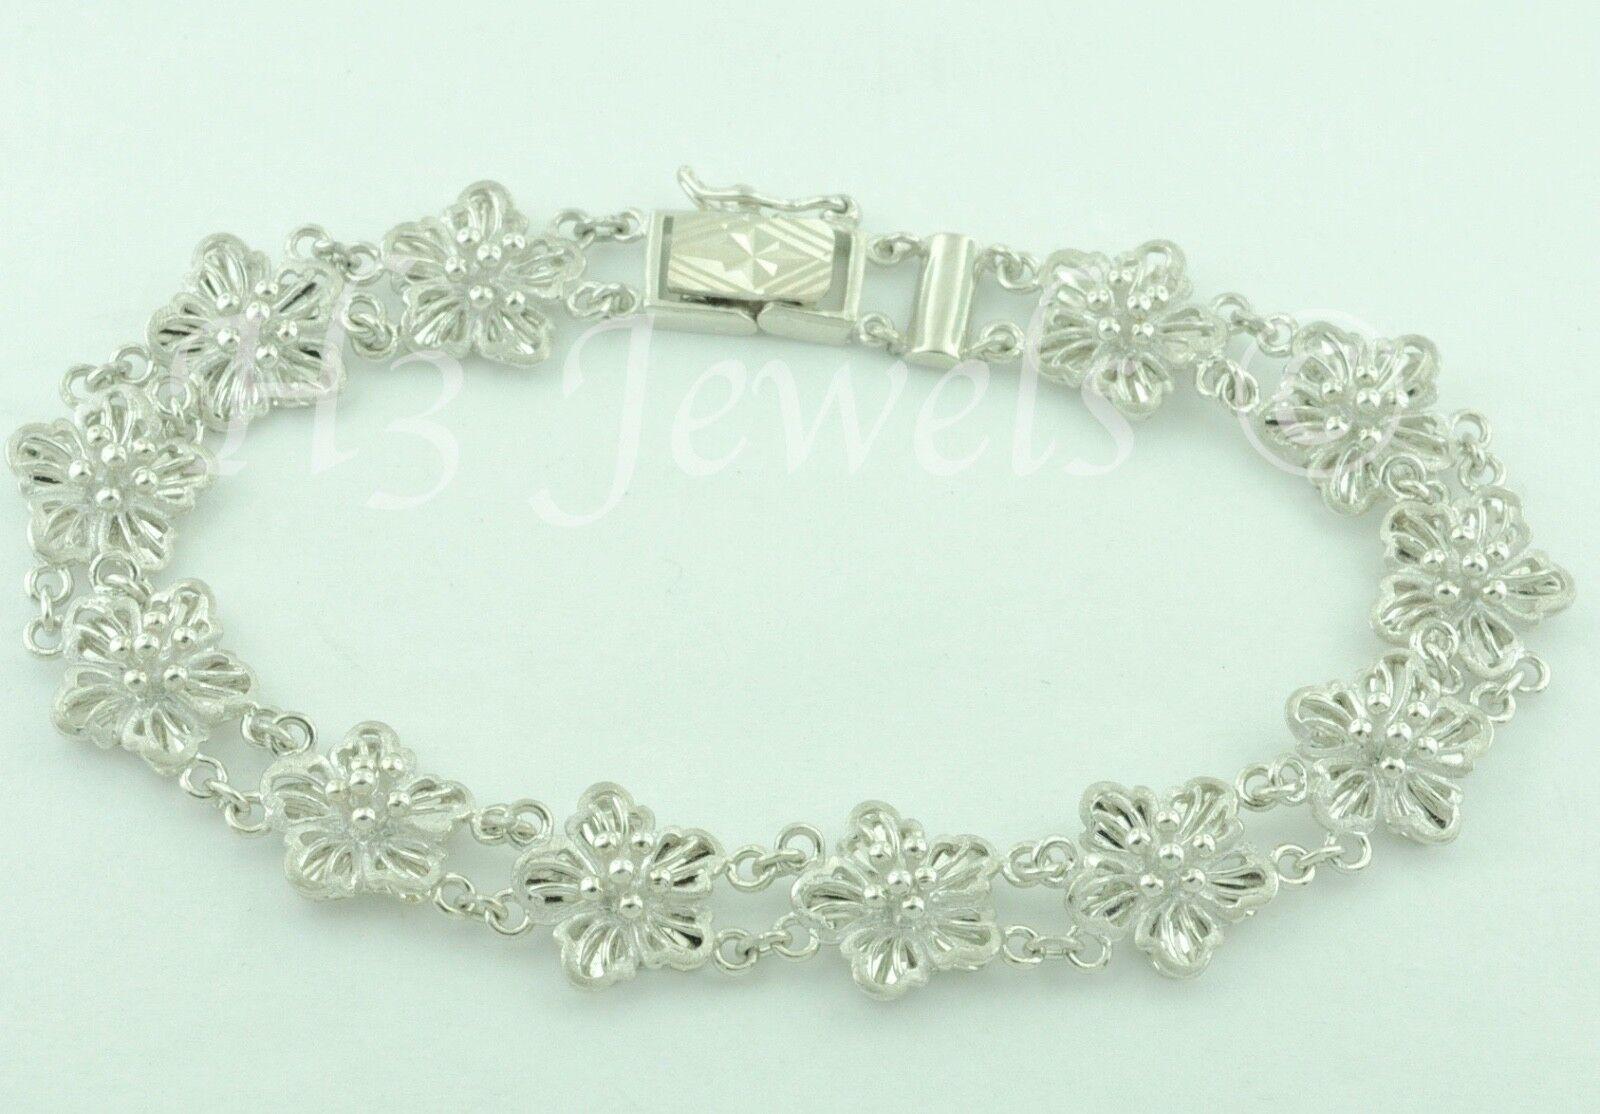 18k white gold diamond cut flower filigree bracelet 15.20 grams h3jewels